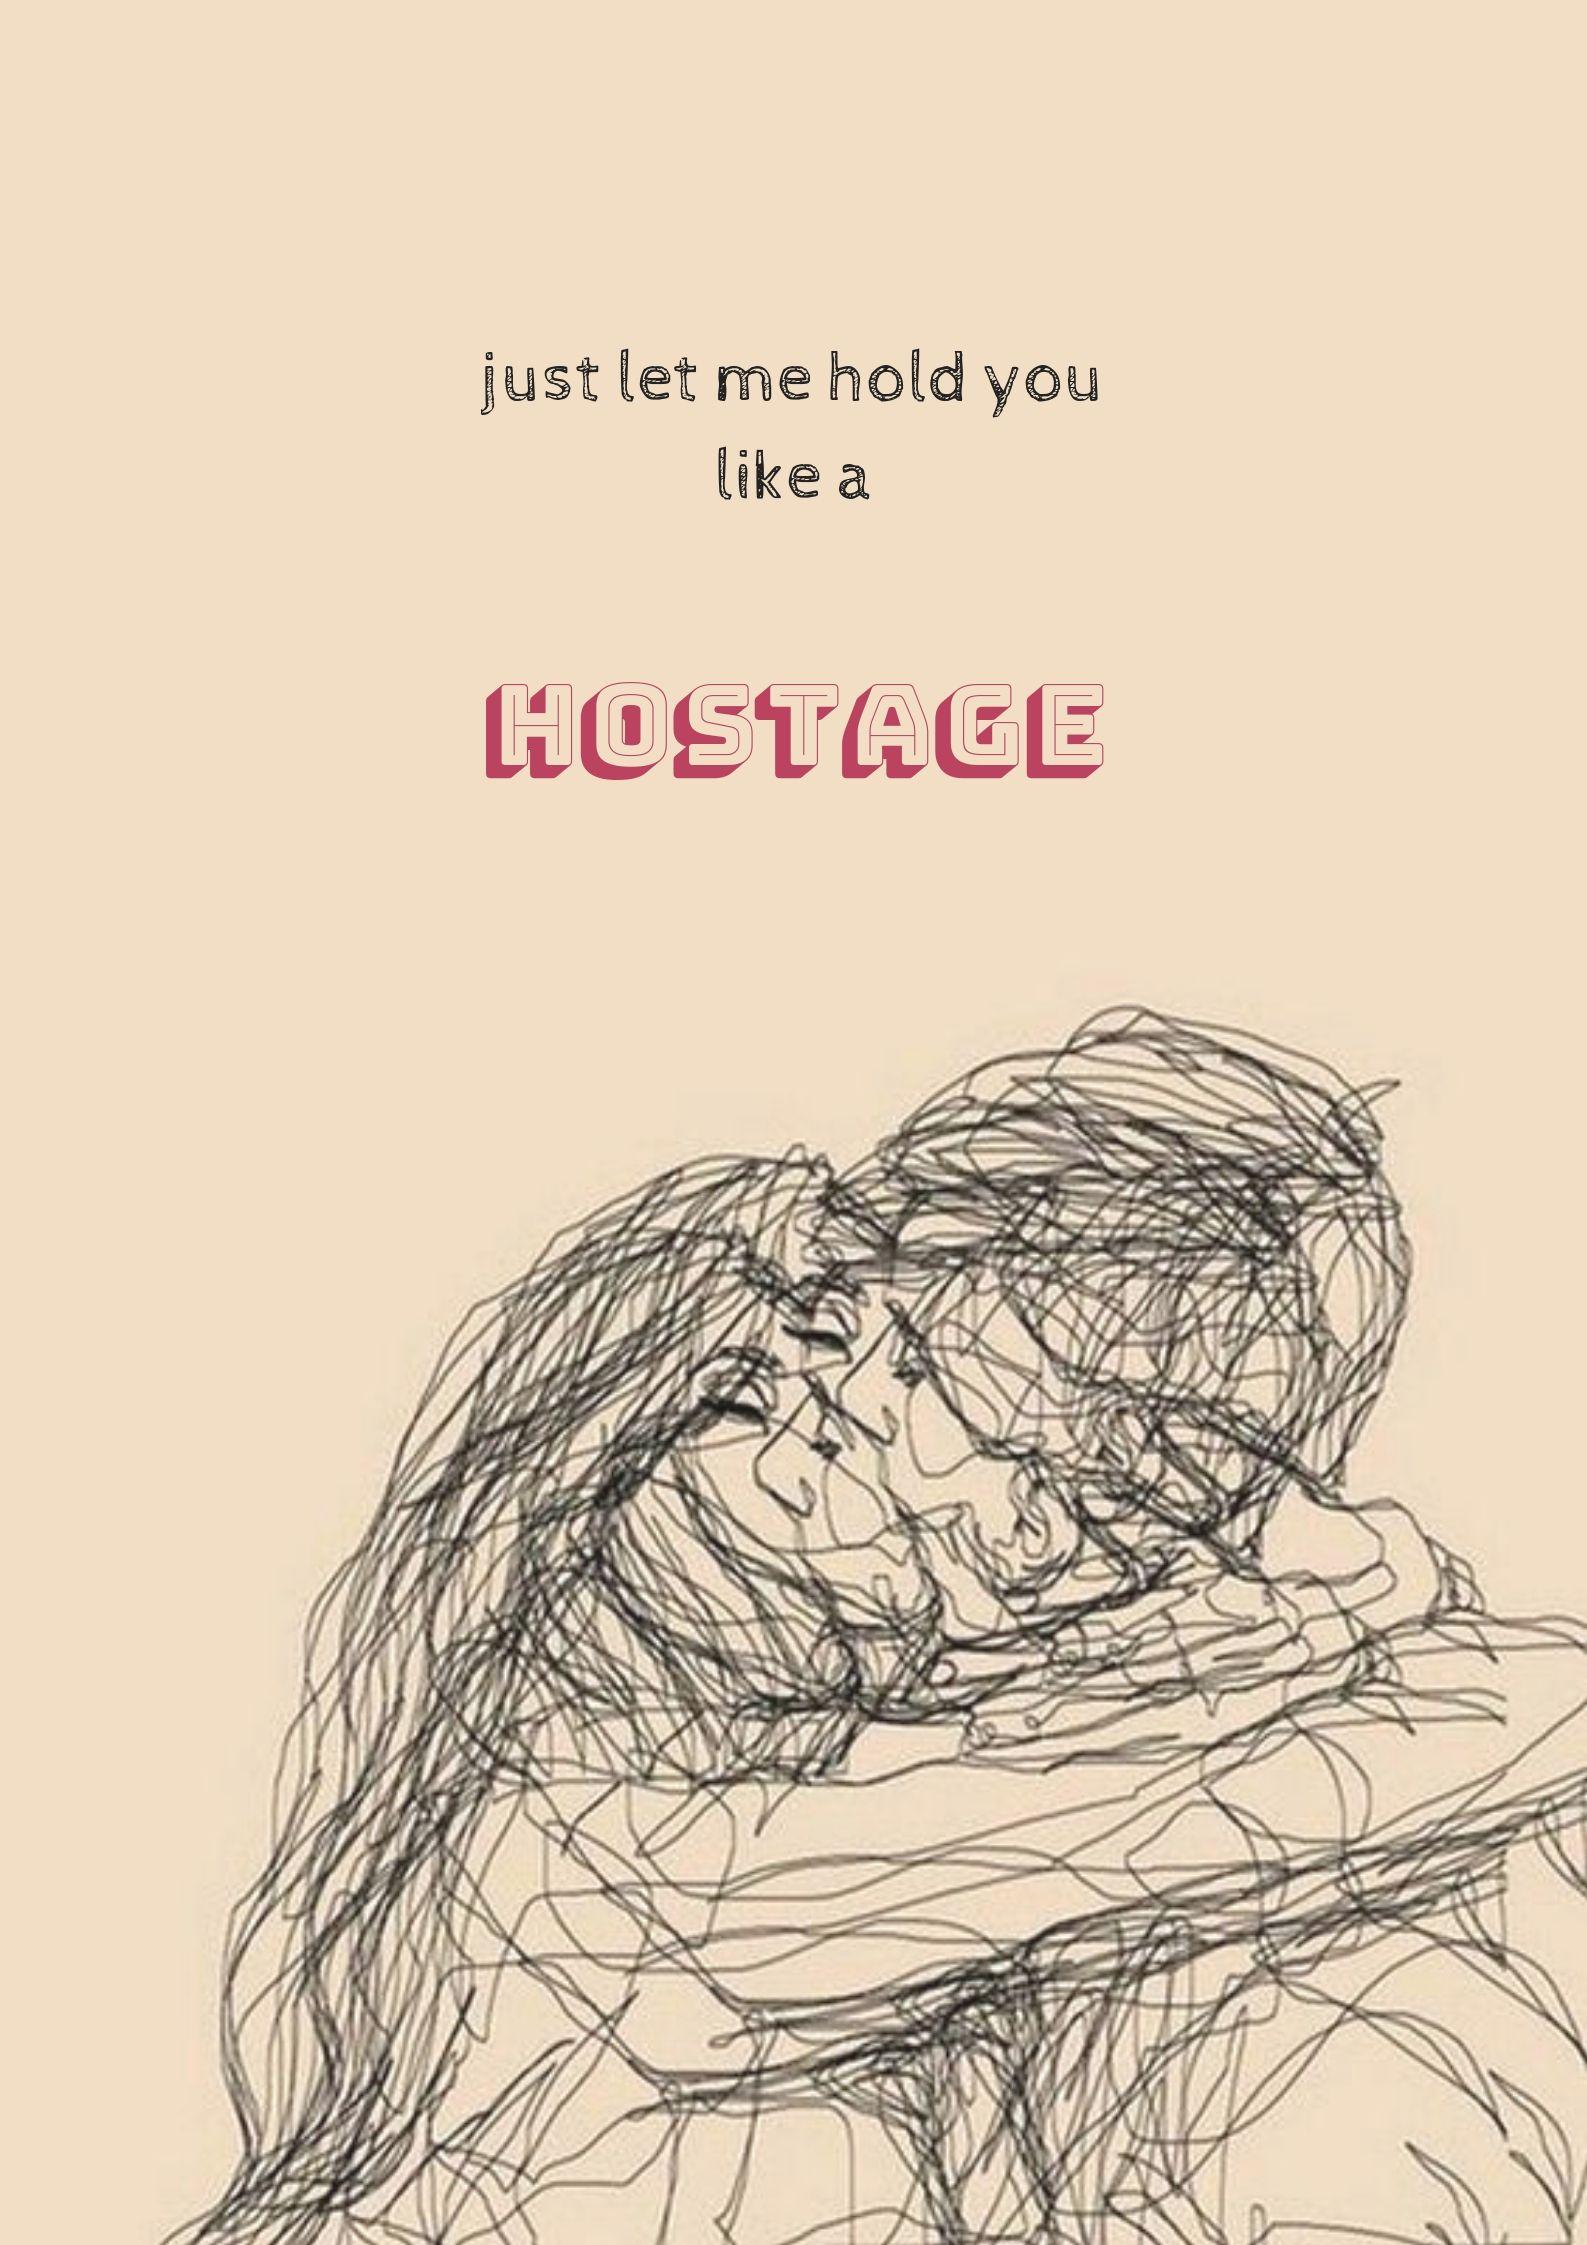 Hostage Billie Eilish Lyrics Billie Pinterest Imsadlu